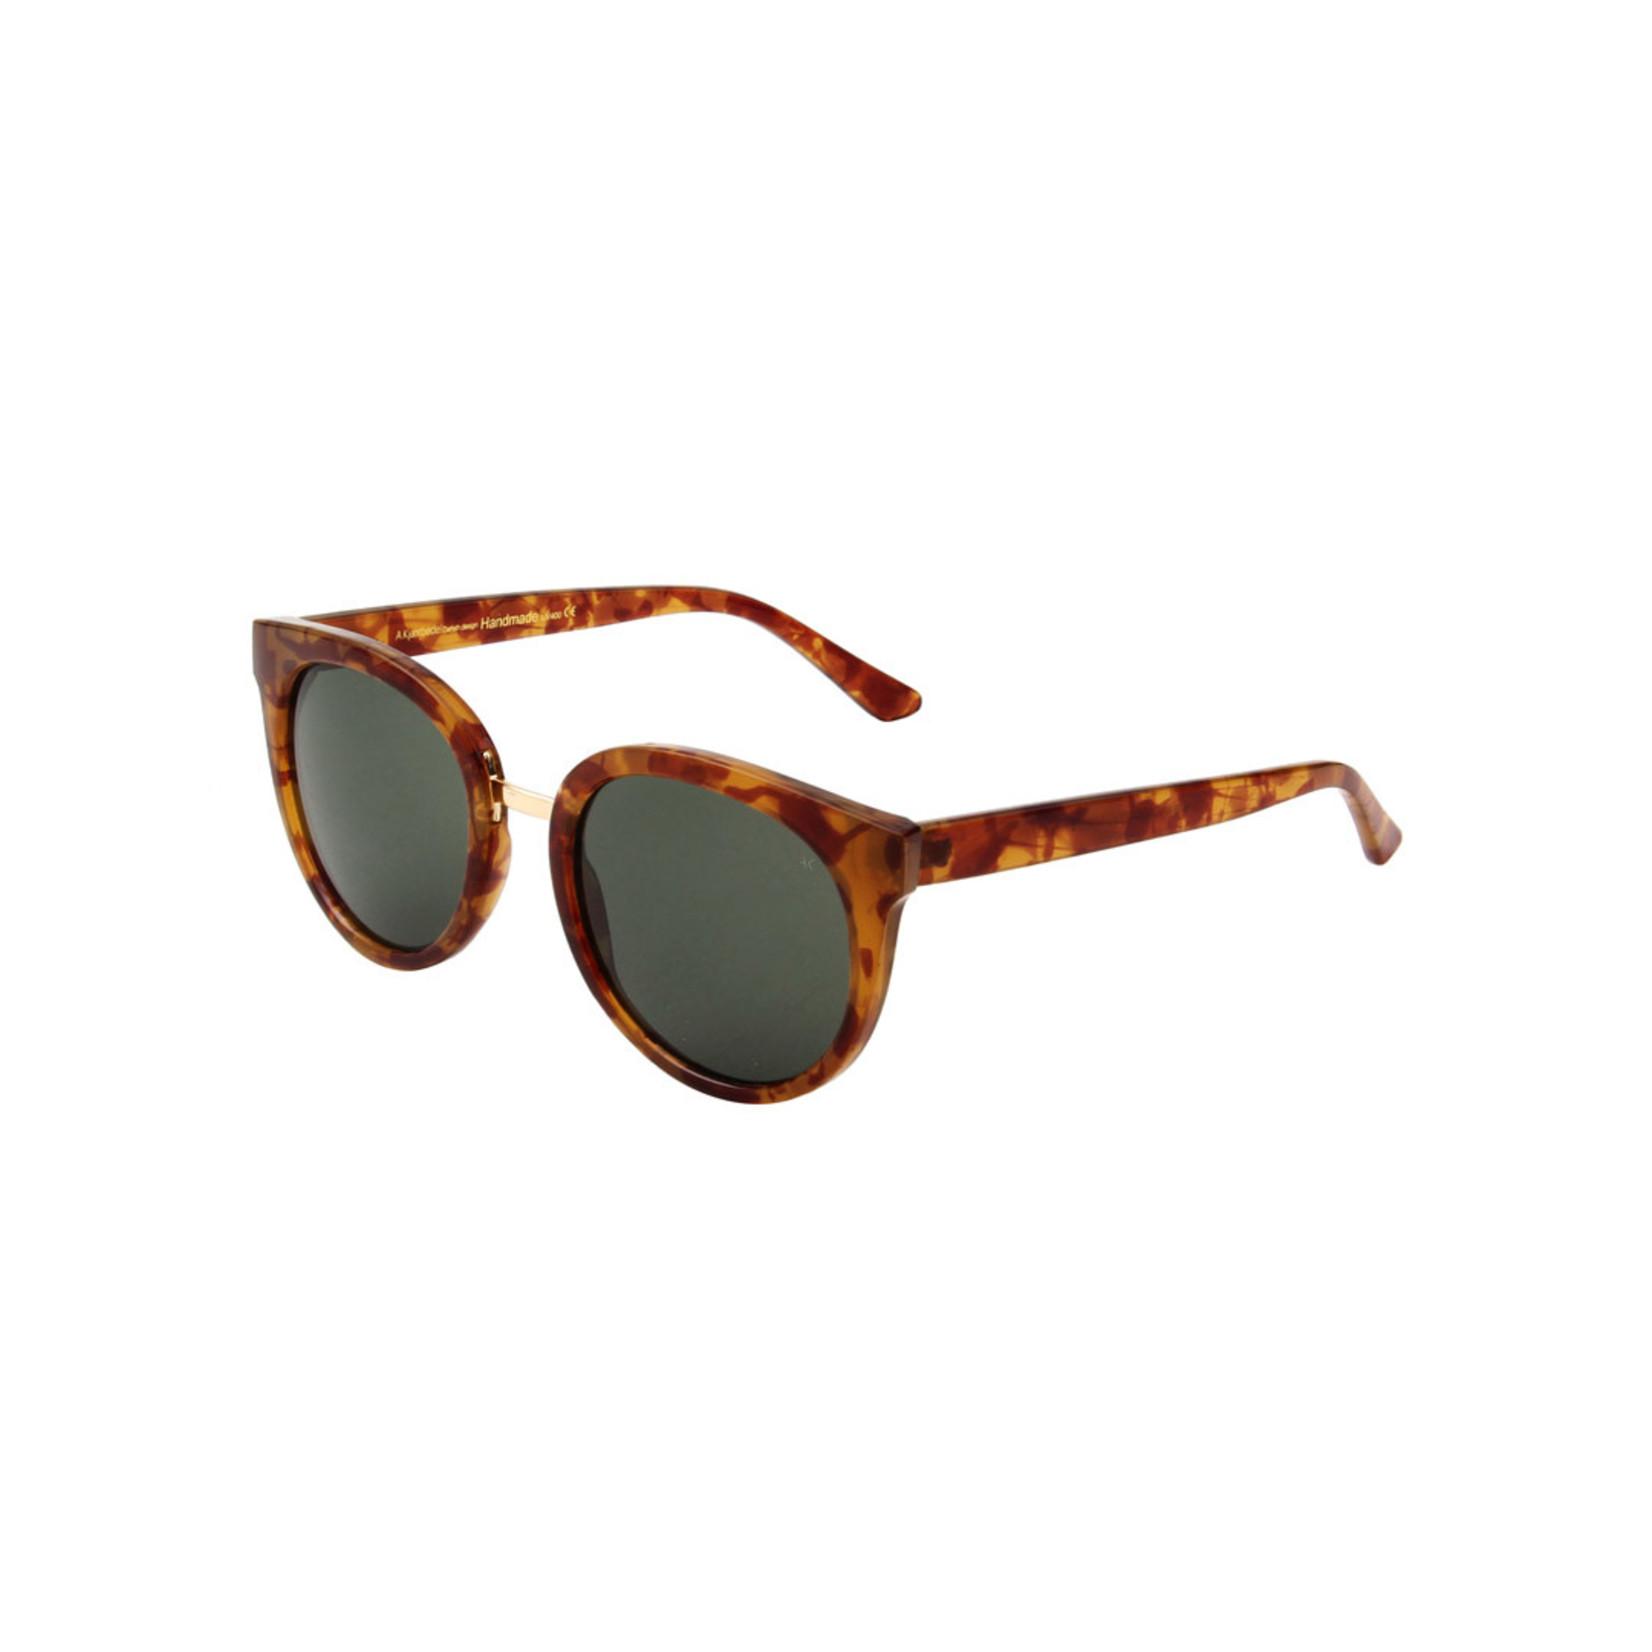 Kjearbede Kjearbede zonnebril Gray Demi Light Brown Tortoise /AC10342-08